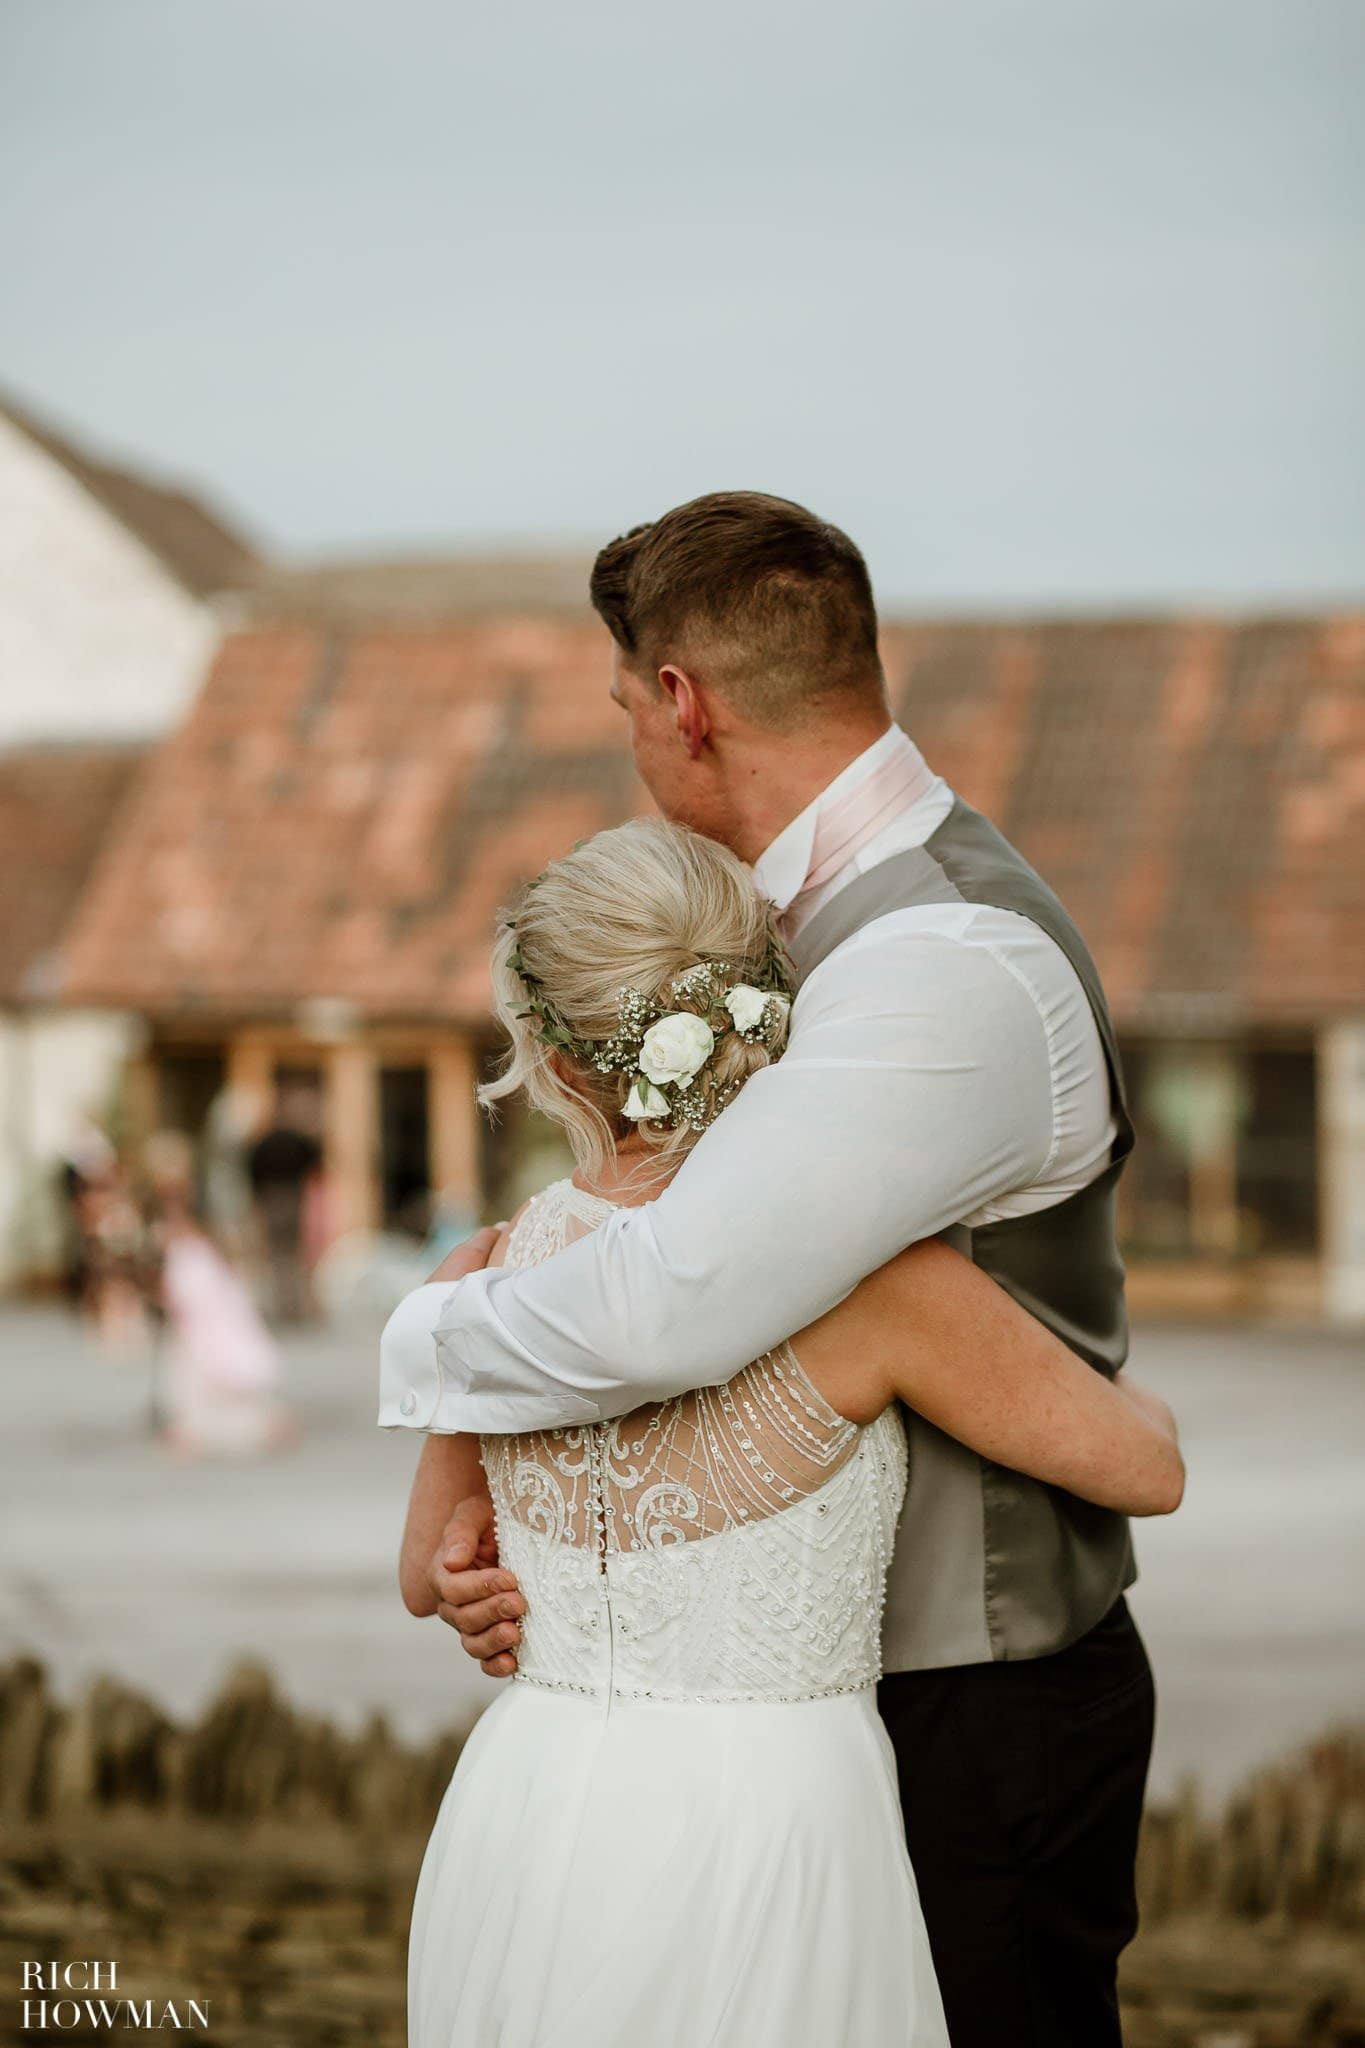 Kingscote Barn Wedding Photographer in Gloucestershire 599